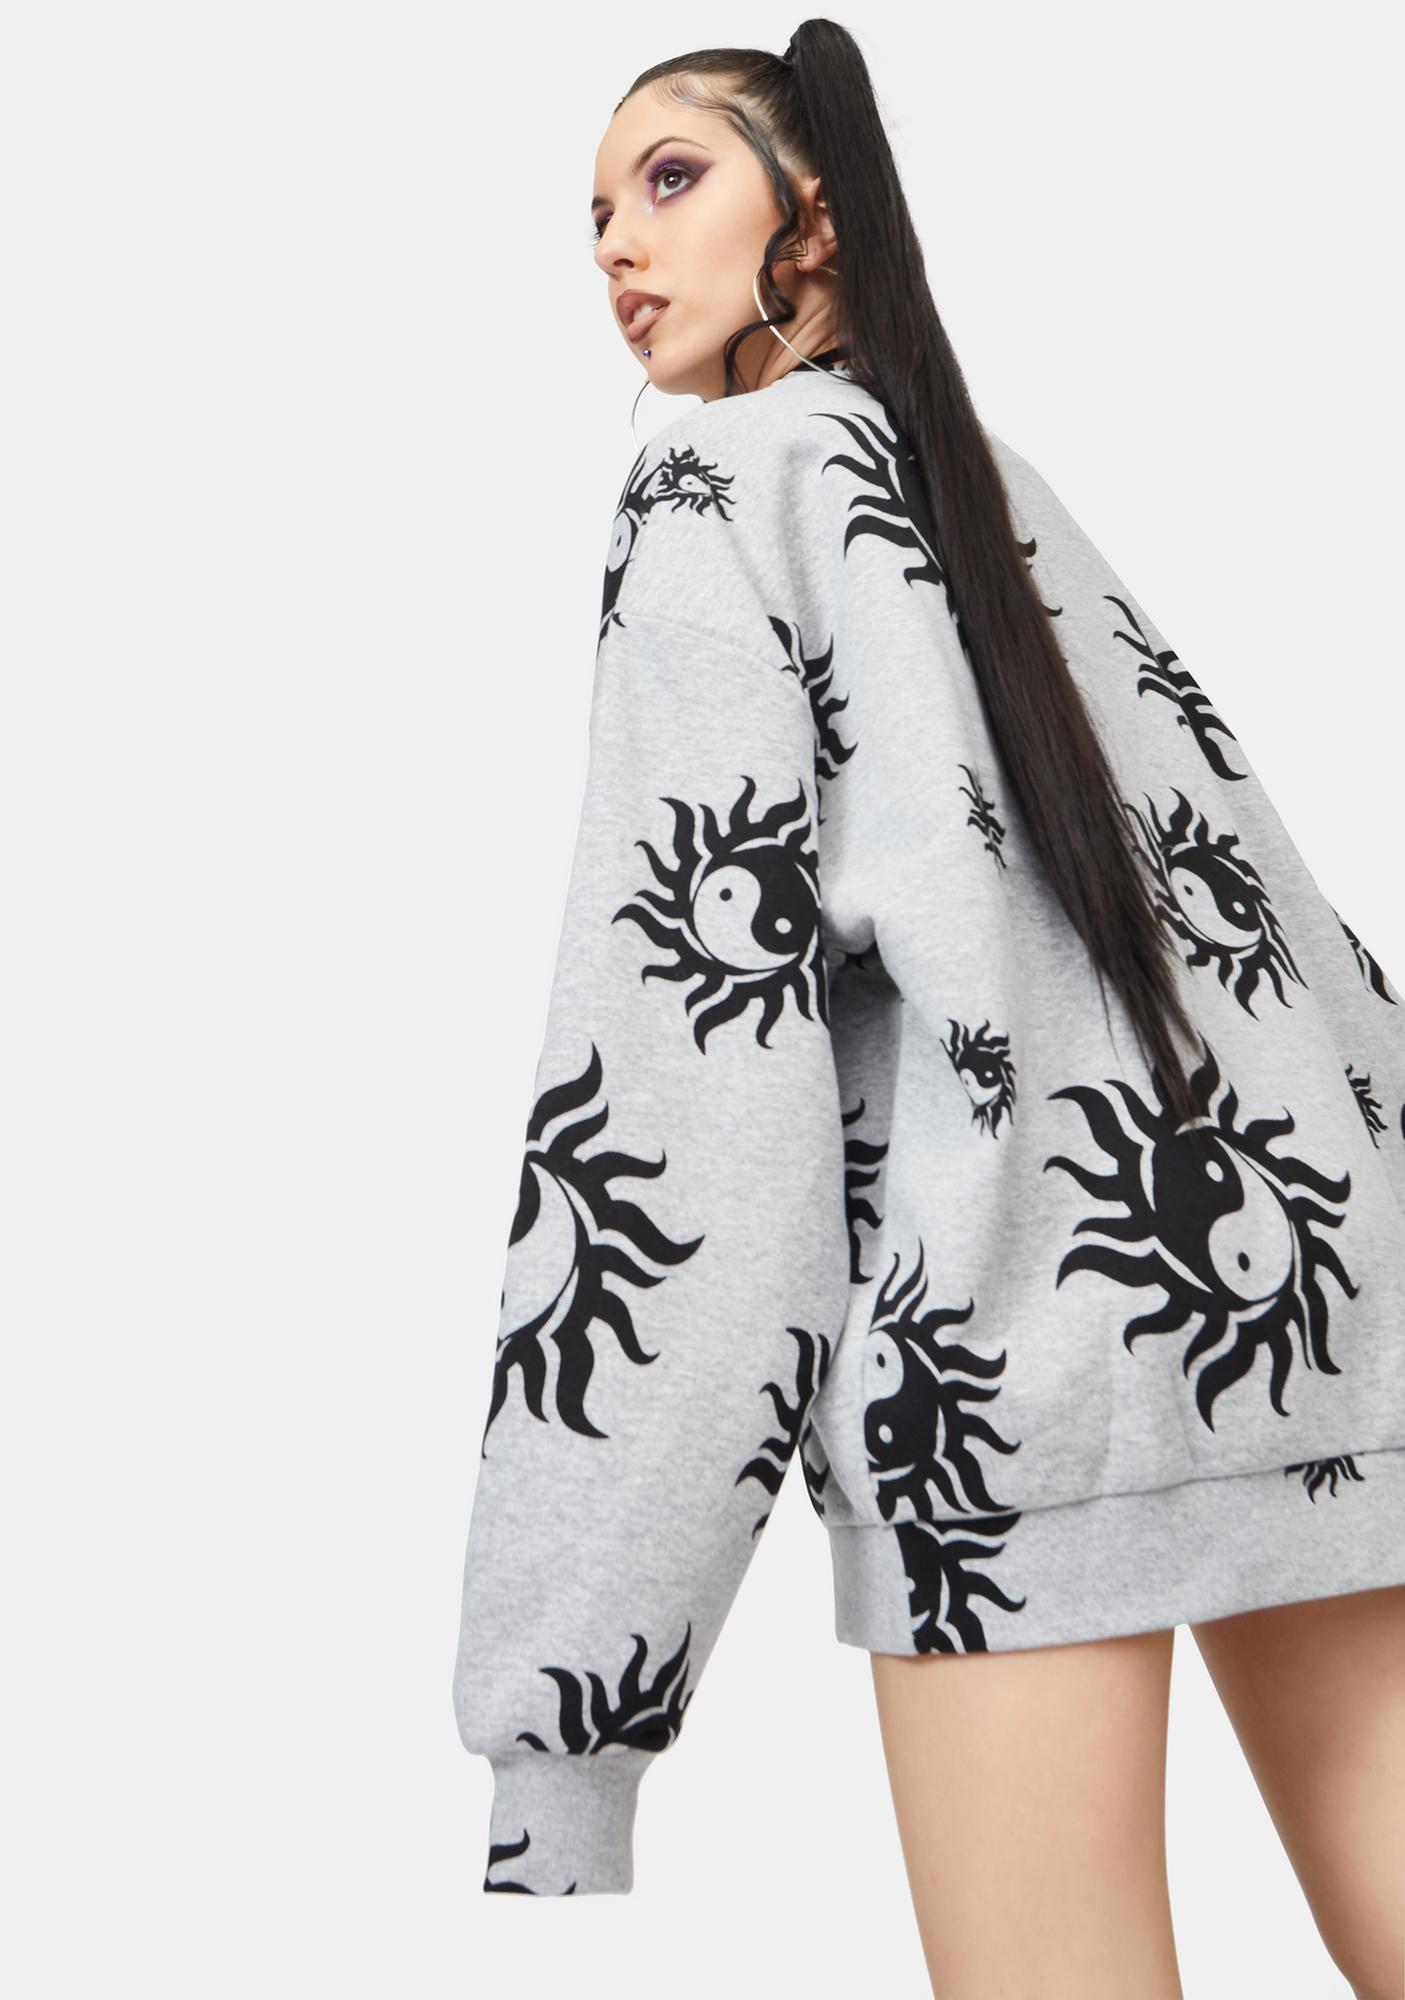 NEW GIRL ORDER Yin Yang Marl Crewneck Sweatshirt